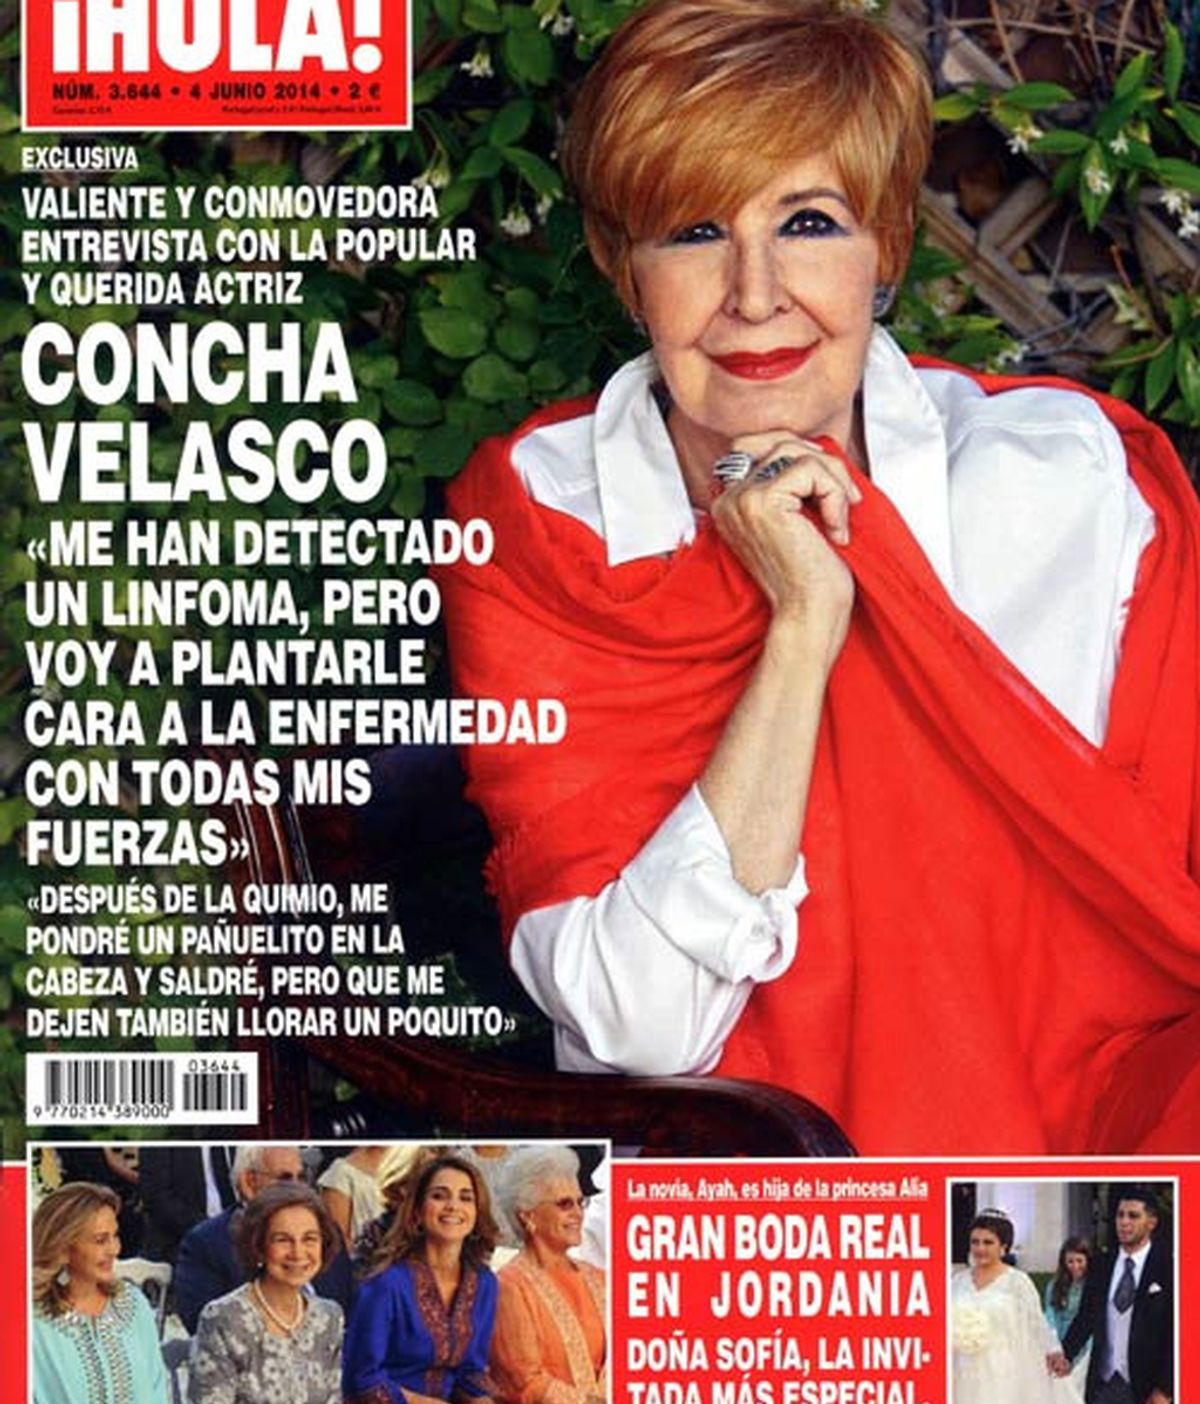 Concha Velasco revela que tiene cáncer